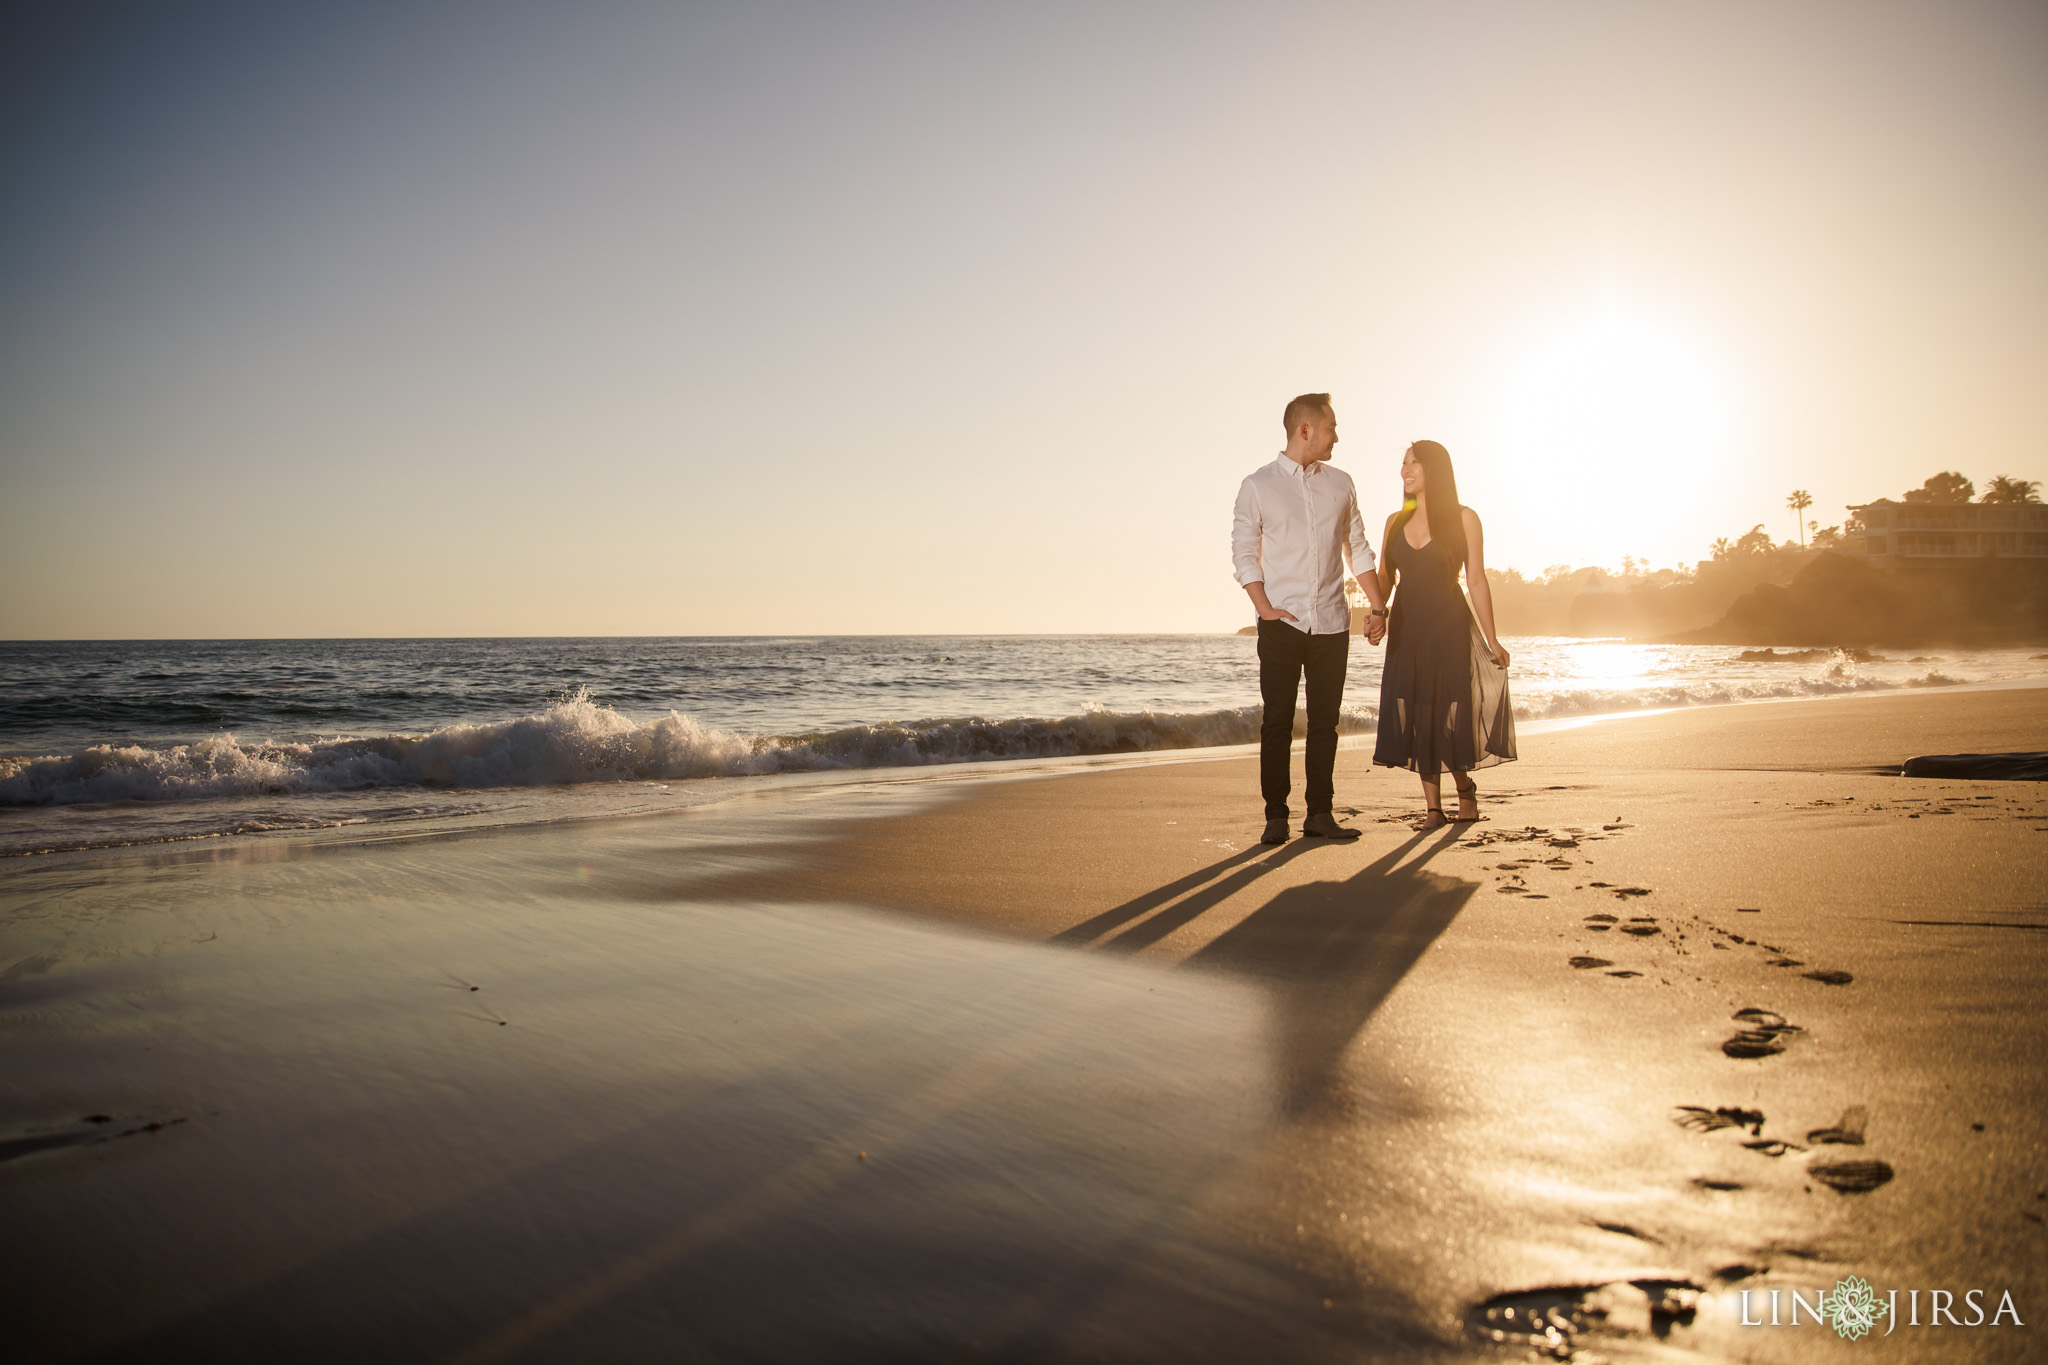 07 Heisler Beach Orange County Proposal Engagement Photography